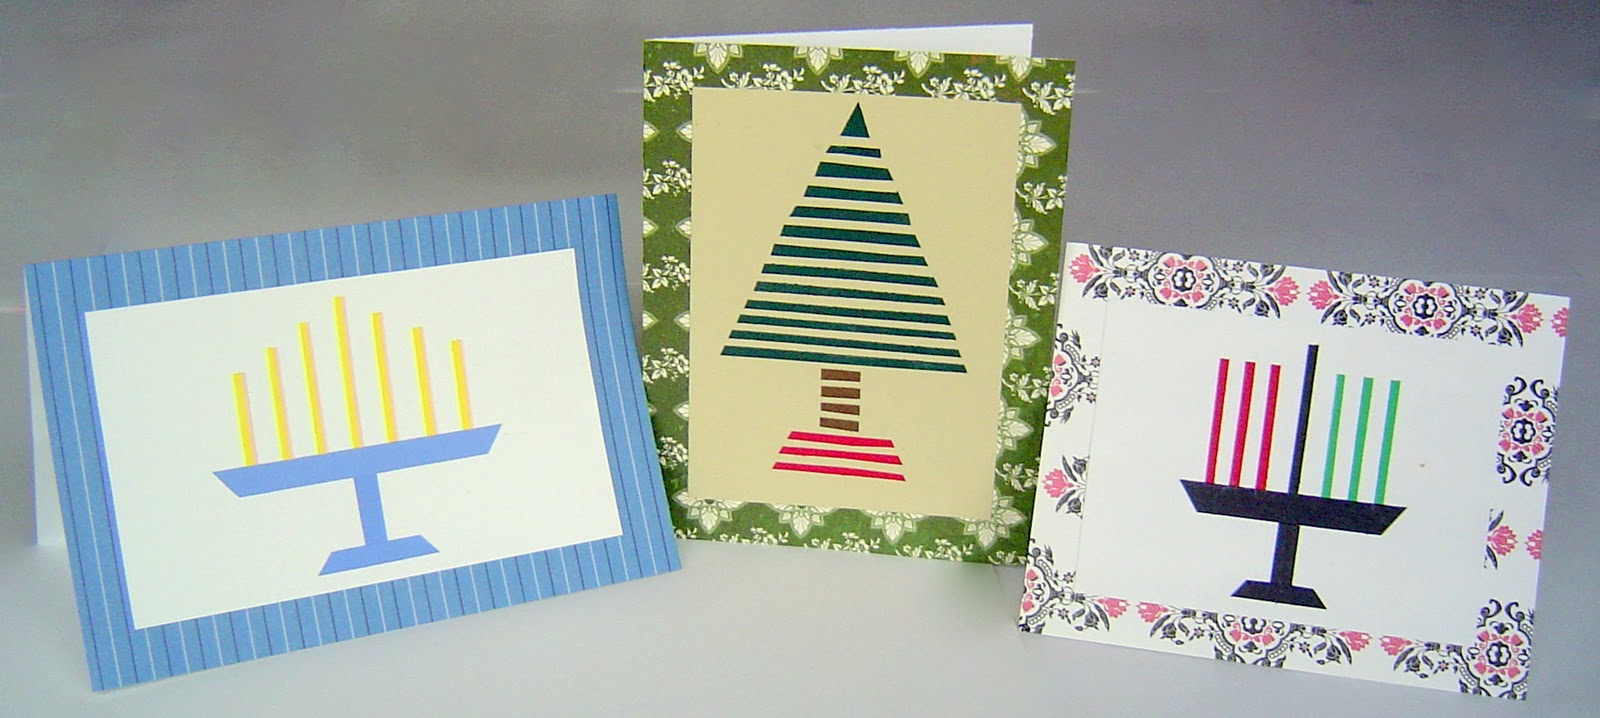 Handmade Crafts Ideas Pinterest